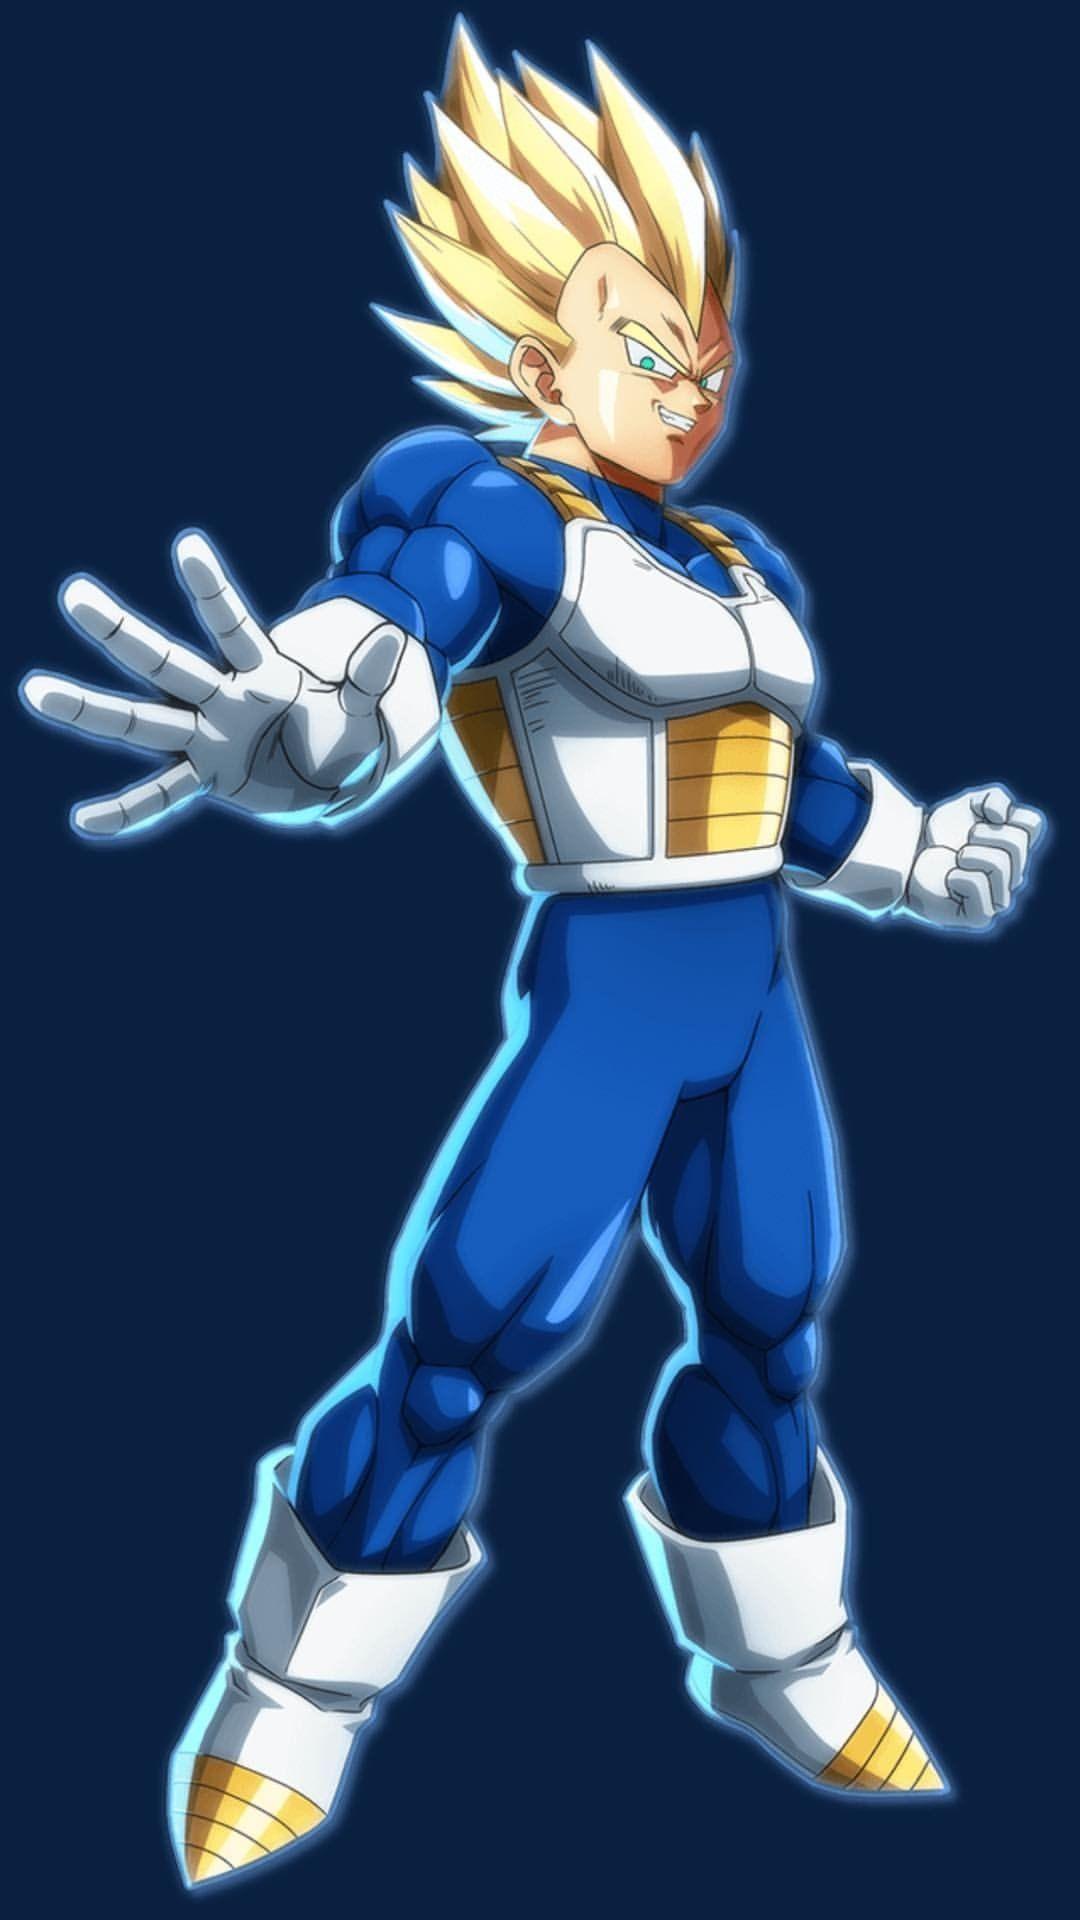 Dragon ball fighterz artificial human 21 arc super saiyan vegeta dragon ball universe - Dragon ball z 21 ...